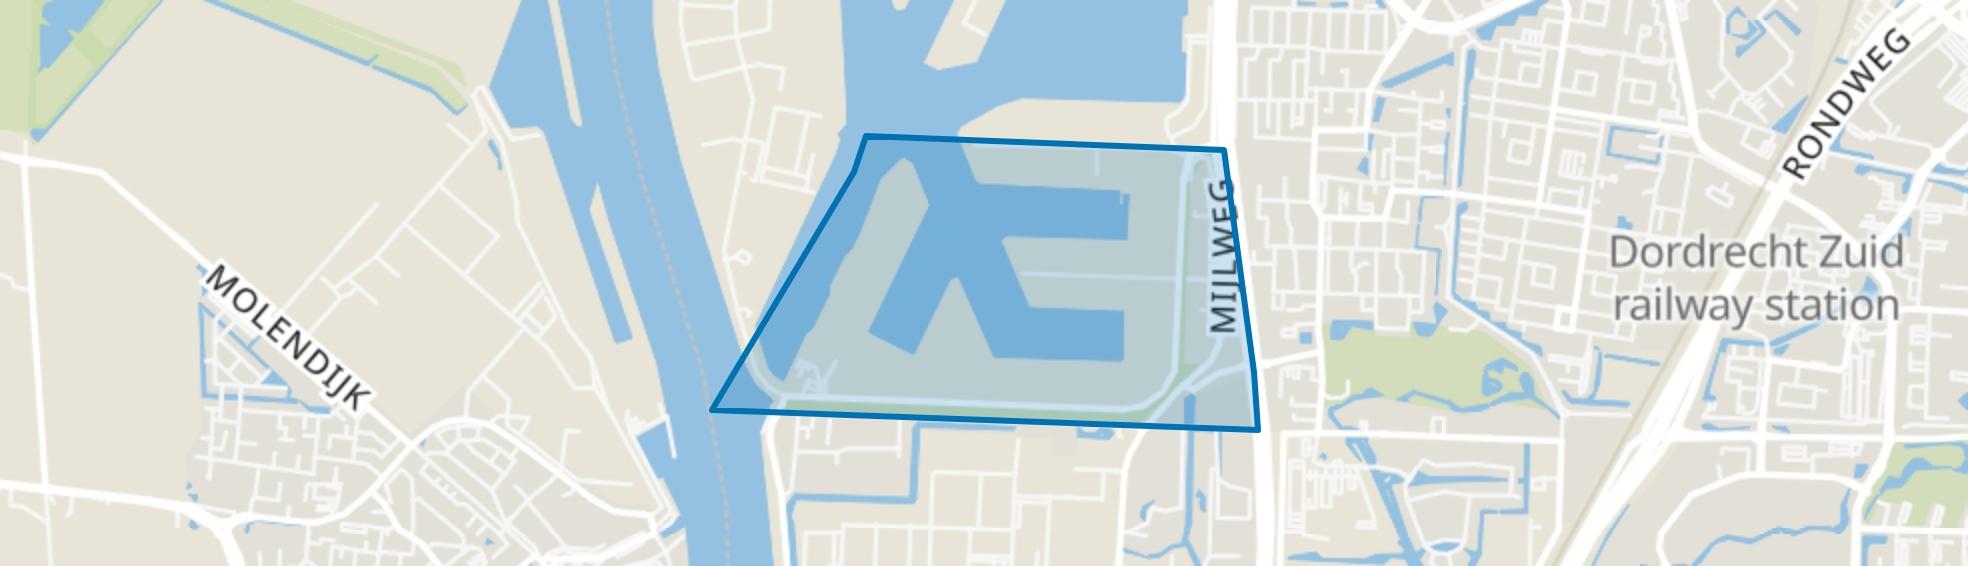 Julianahaven, Dordrecht map